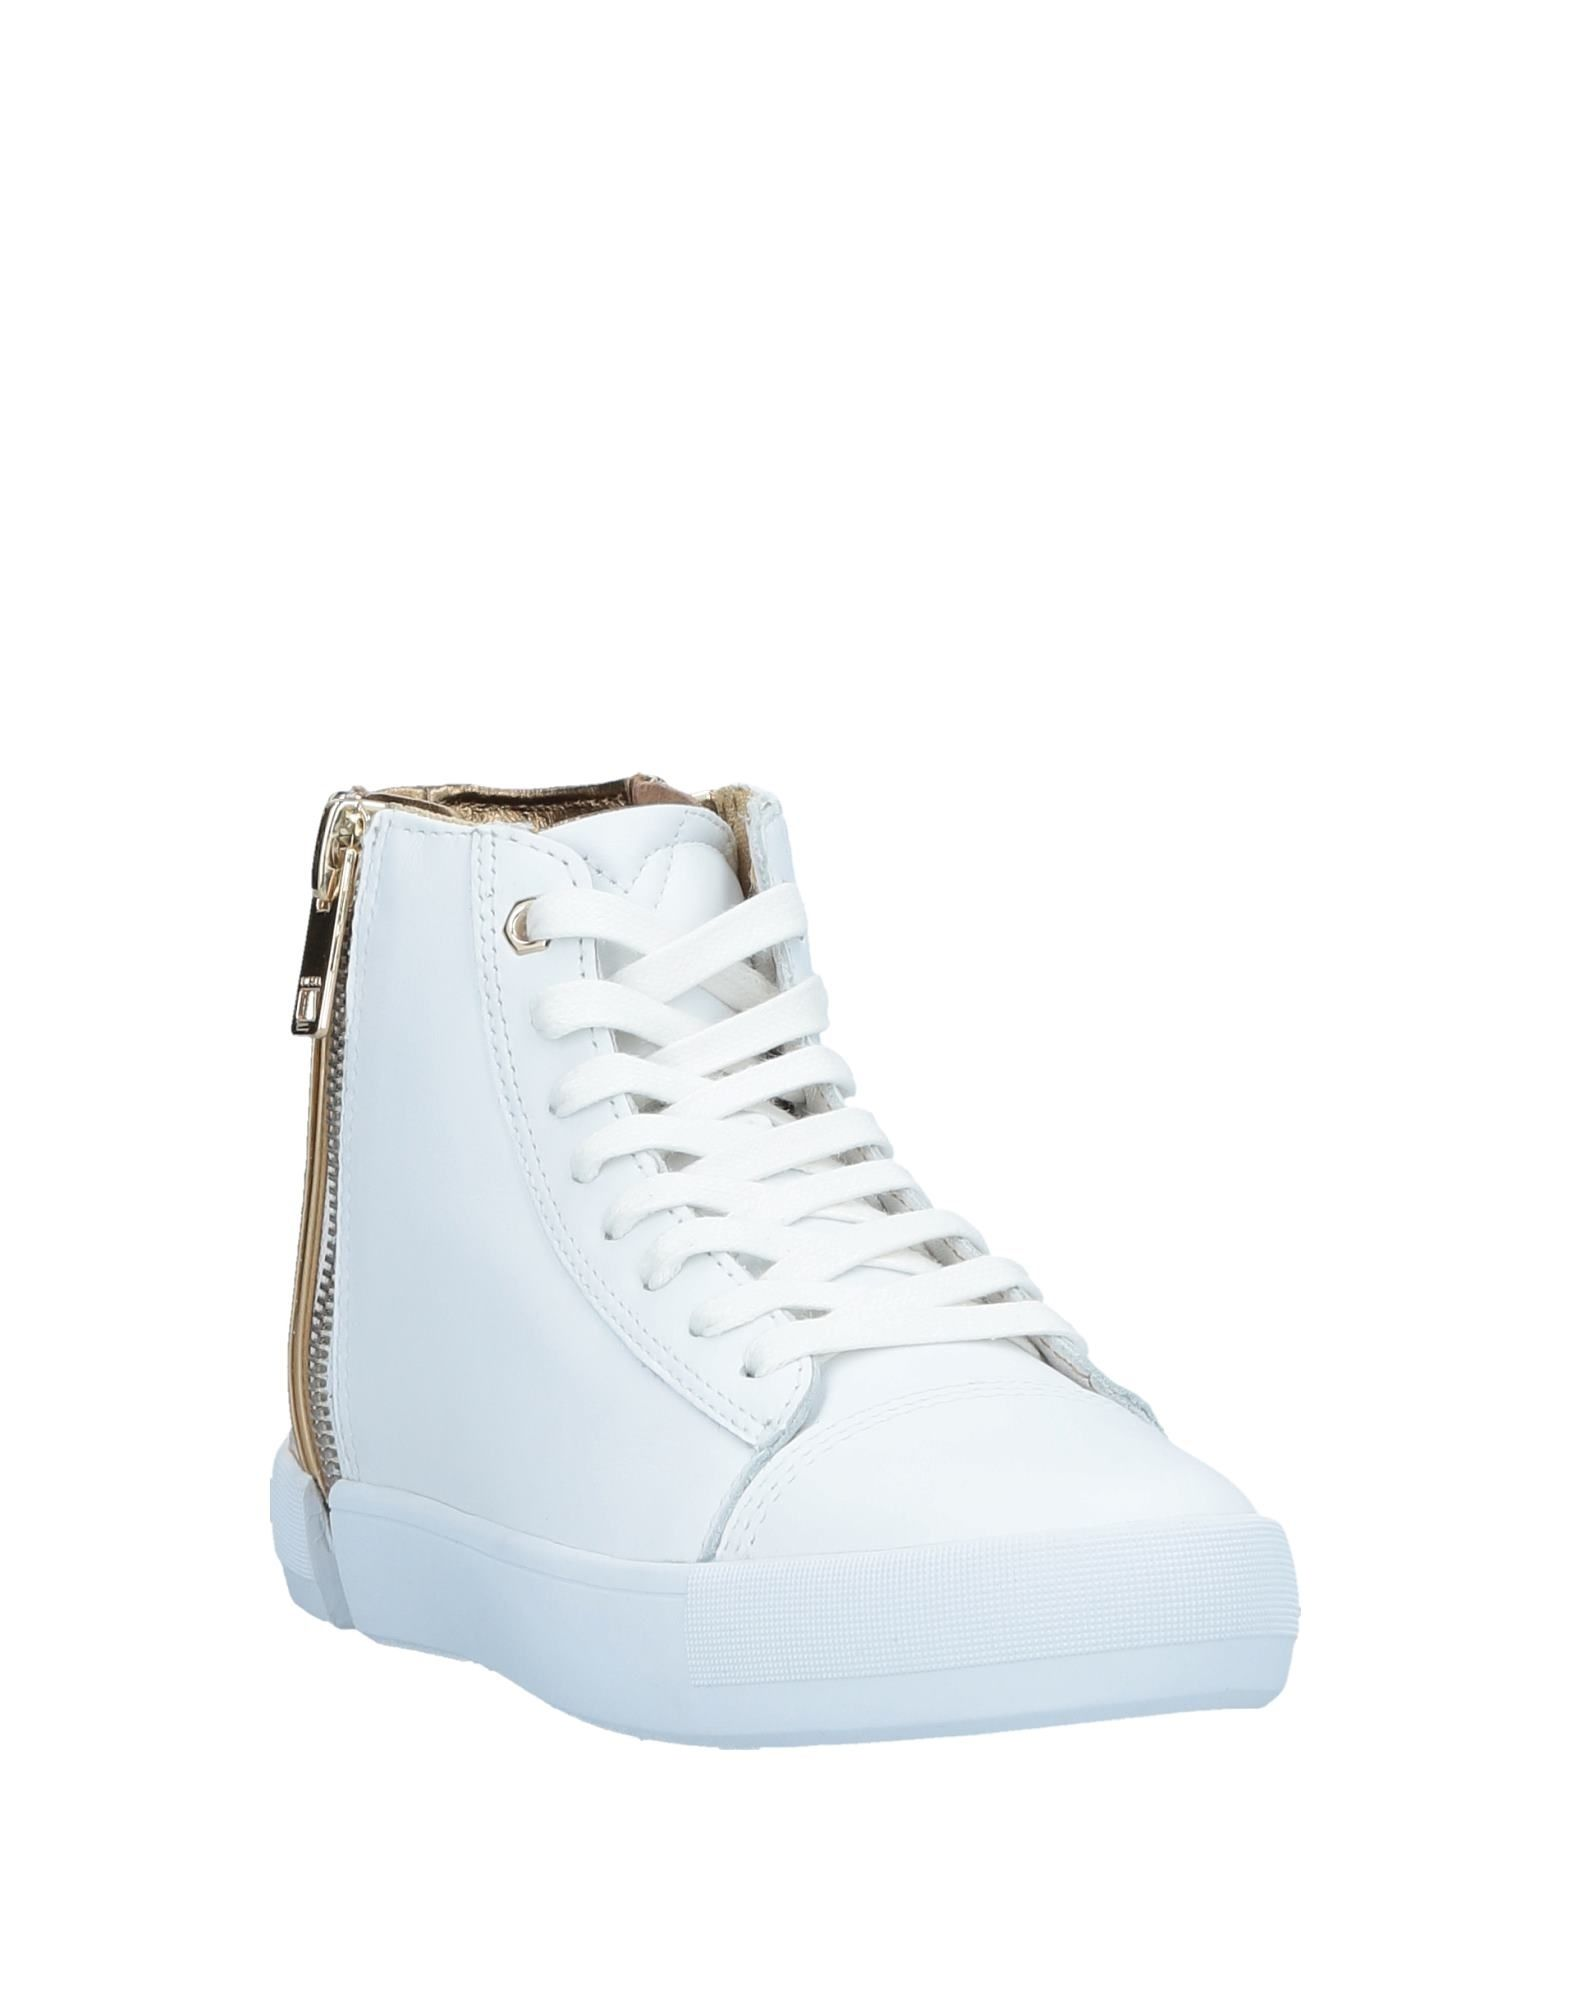 Stilvolle Damen billige Schuhe Diesel Sneakers Damen Stilvolle  11535758DU 3e07e7